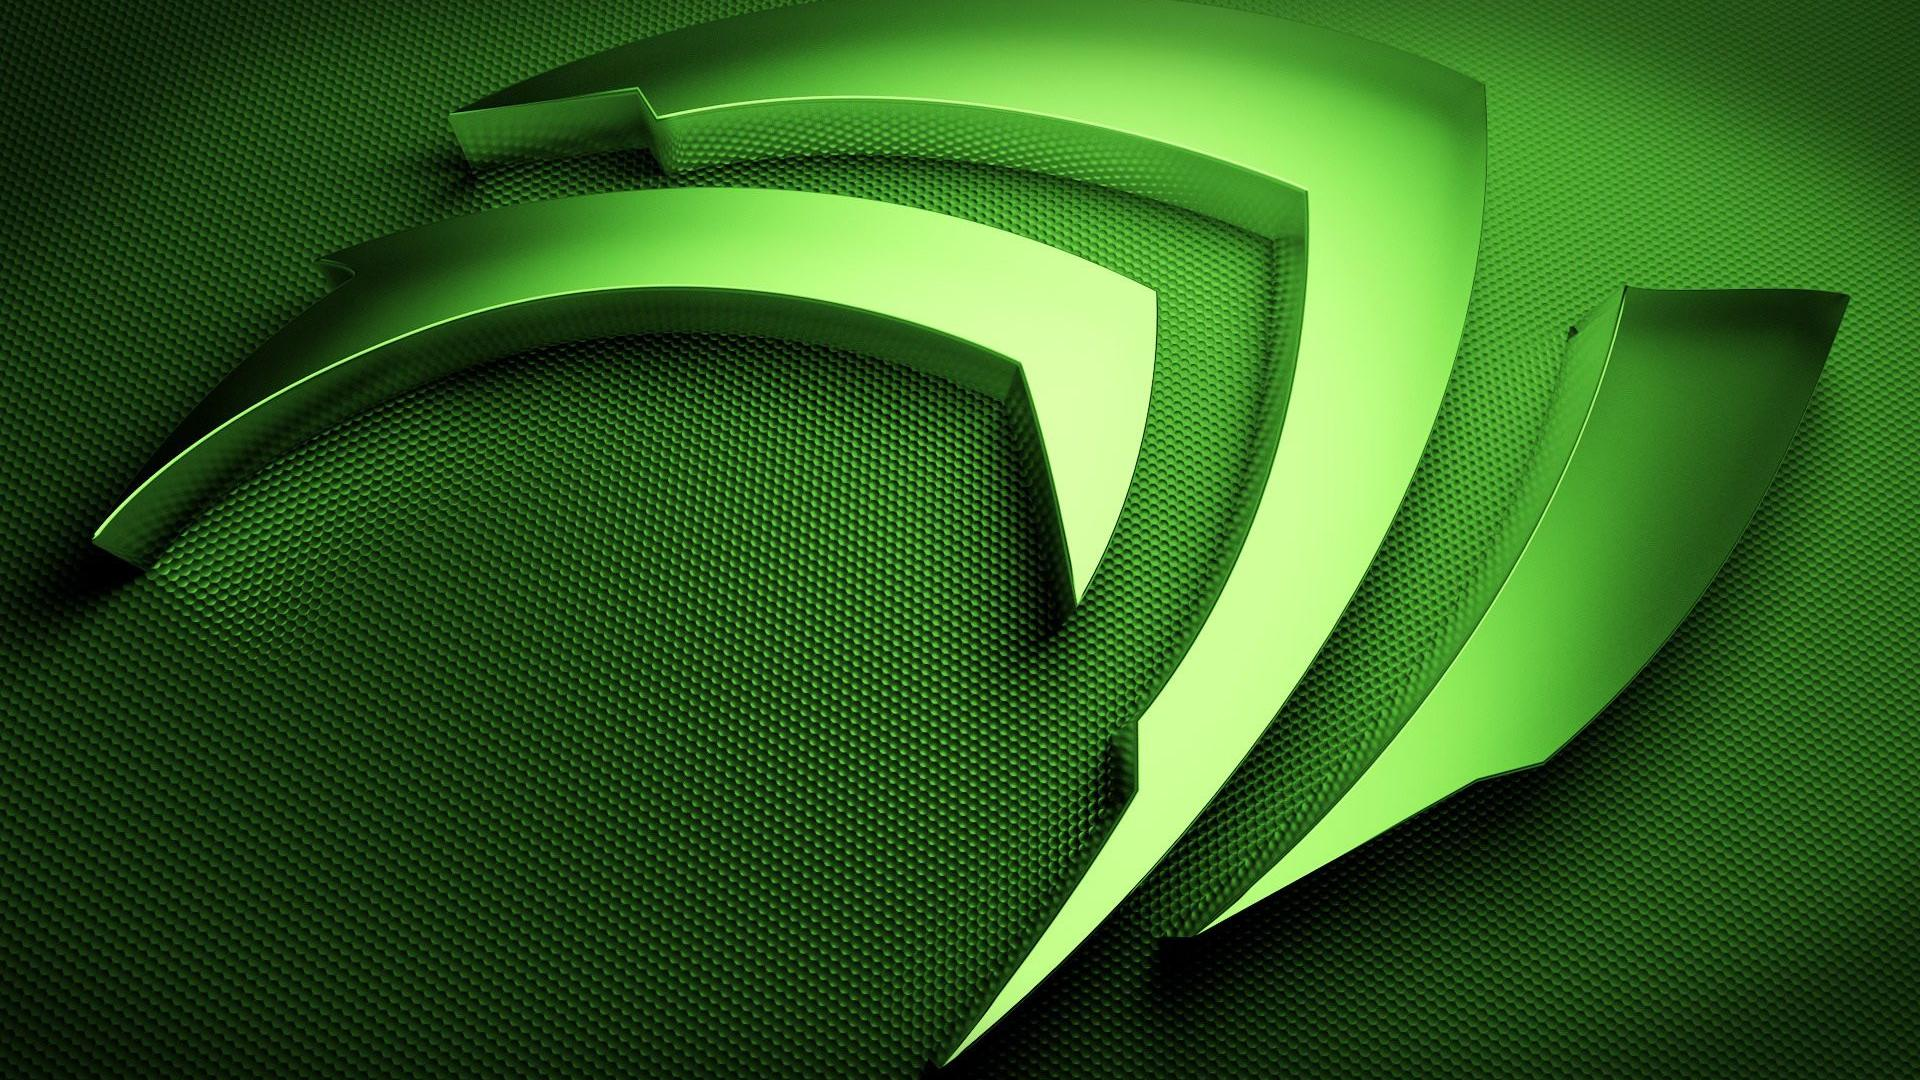 NVIDIA-Green-1080x1920.jpg